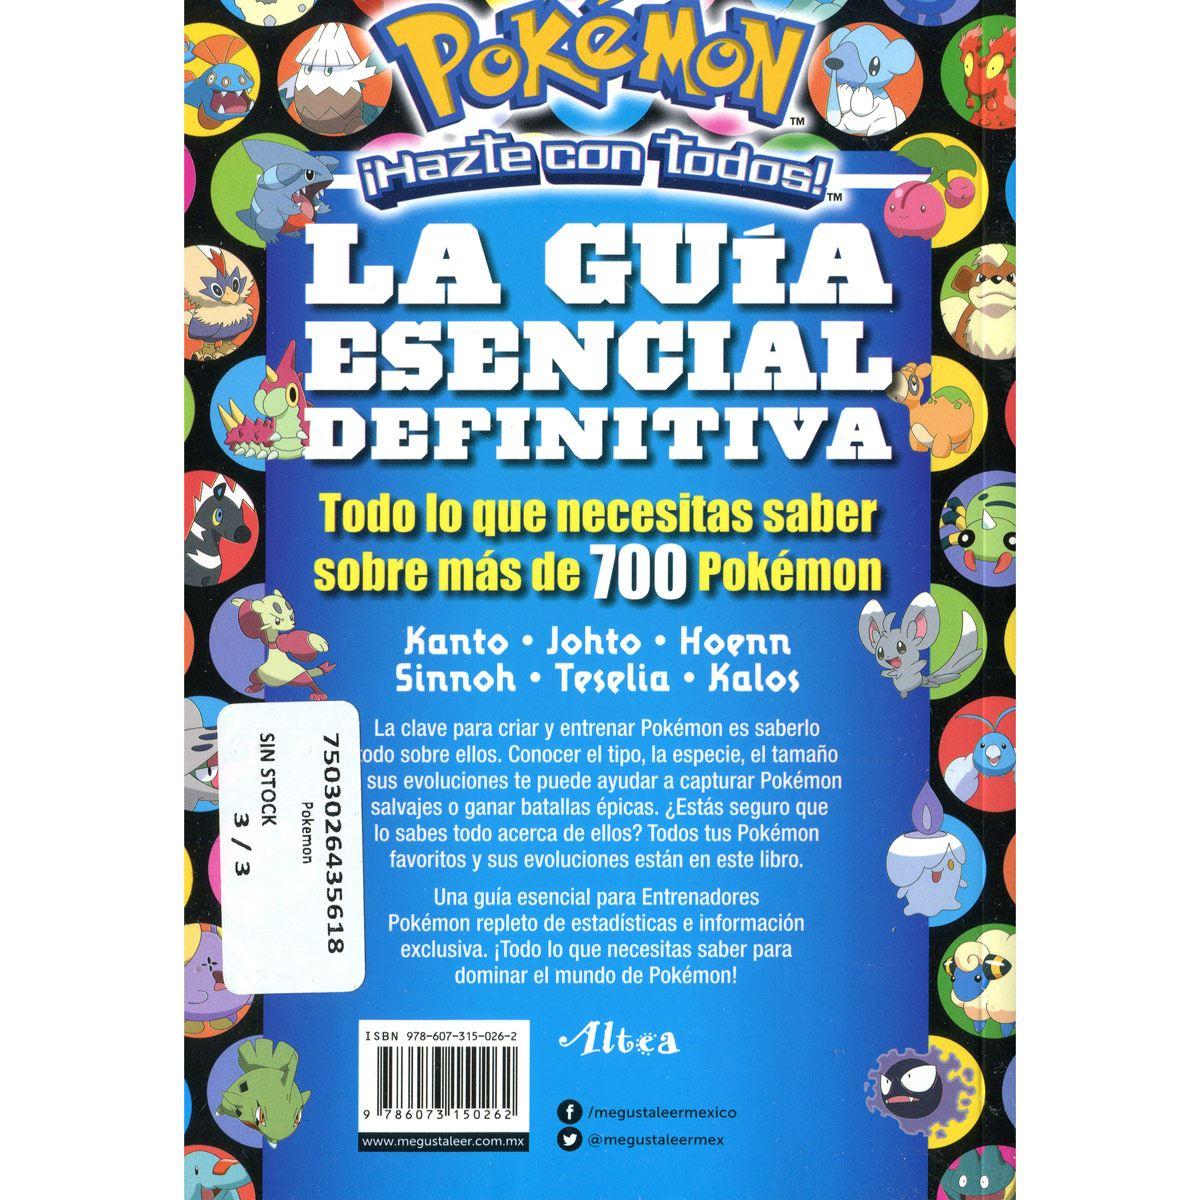 Paquete Pokemon